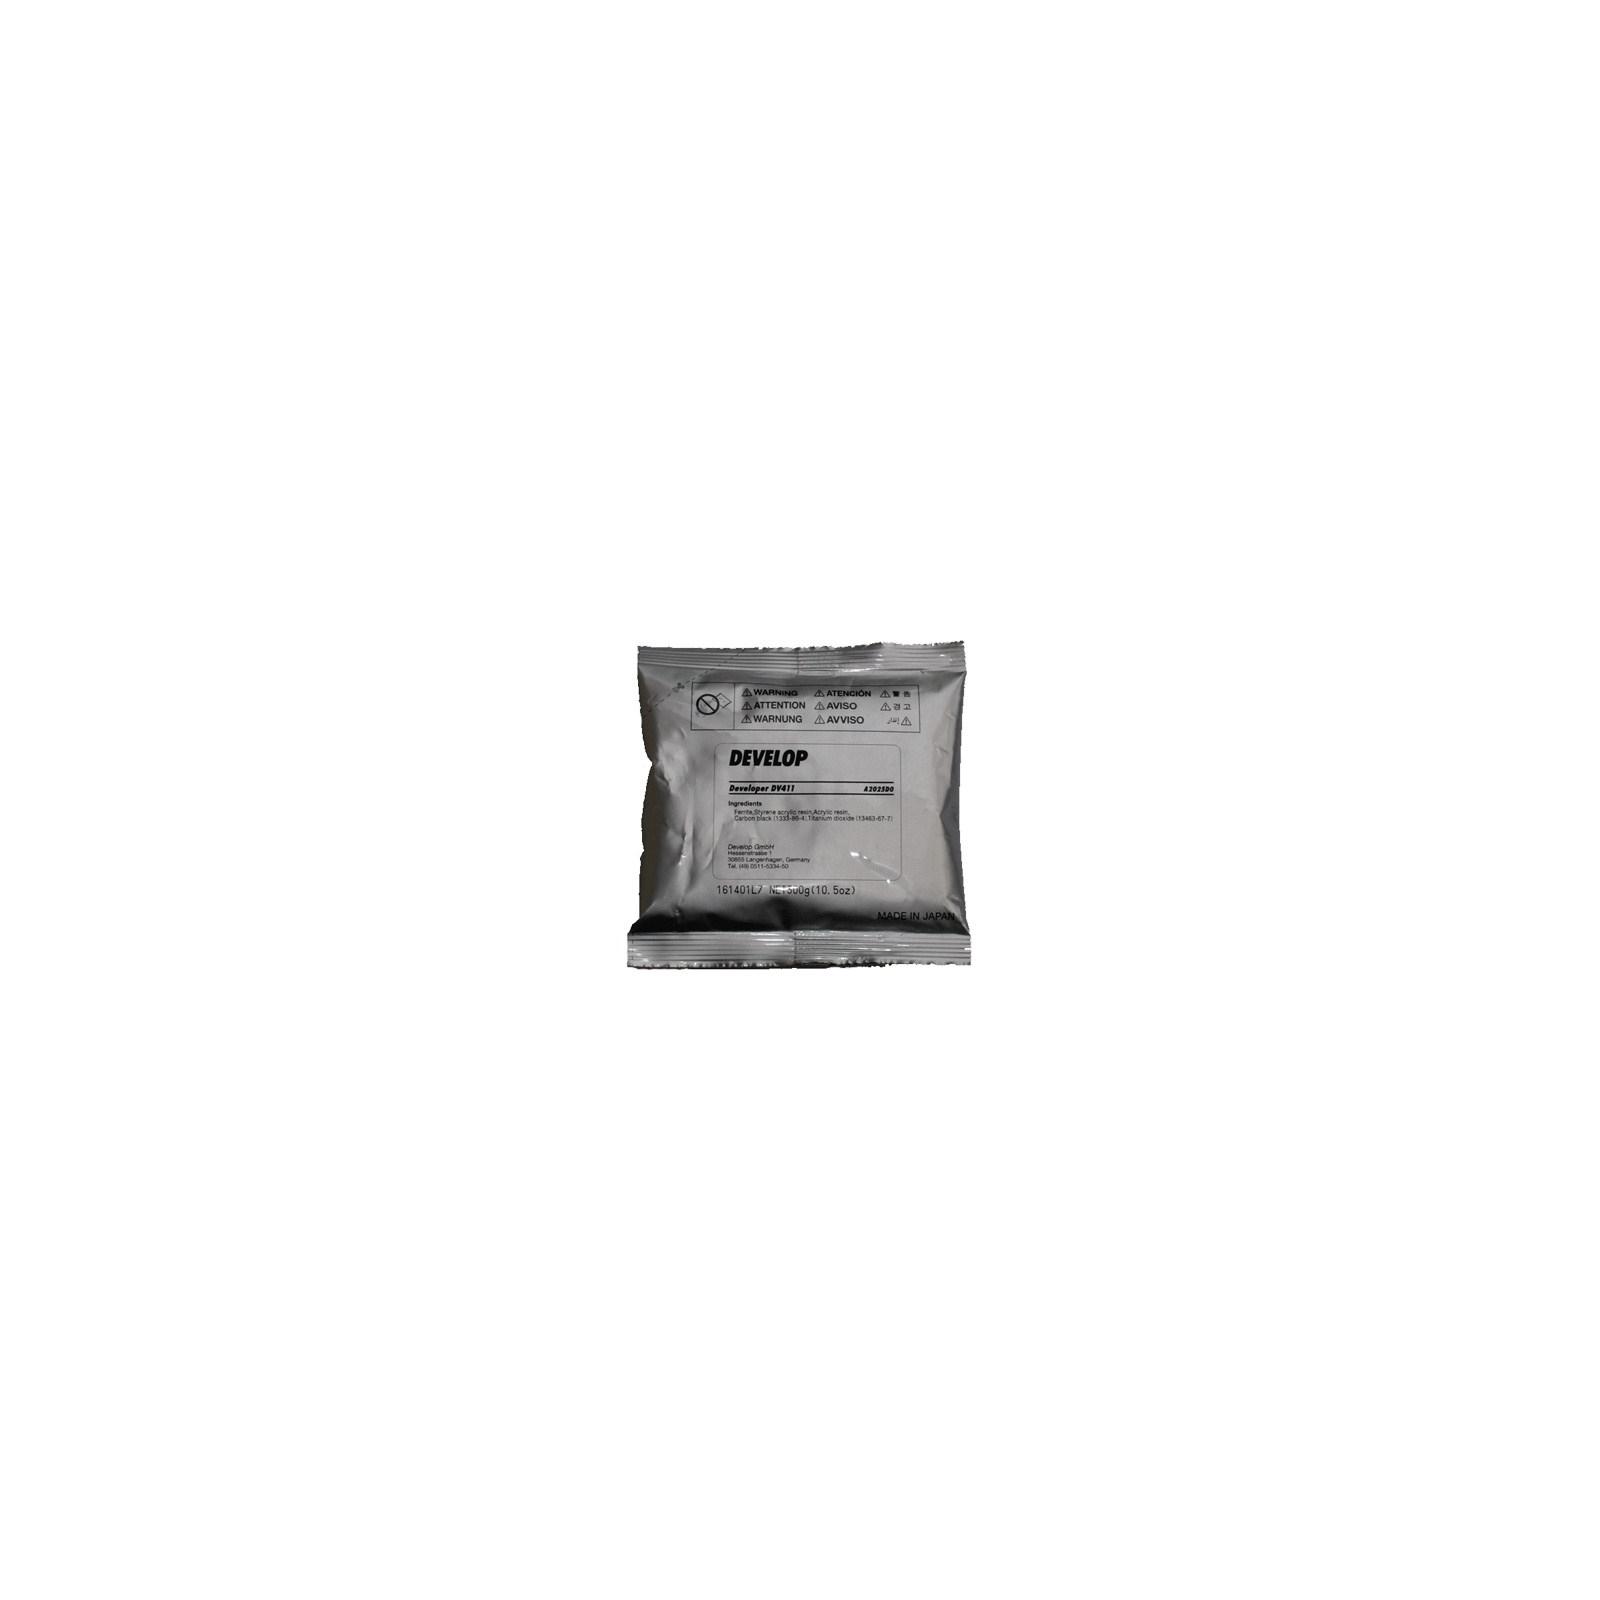 Девелопер Develop DV-411 (для ineo 36/42/223/283/363/423) 120K (A2025D0)